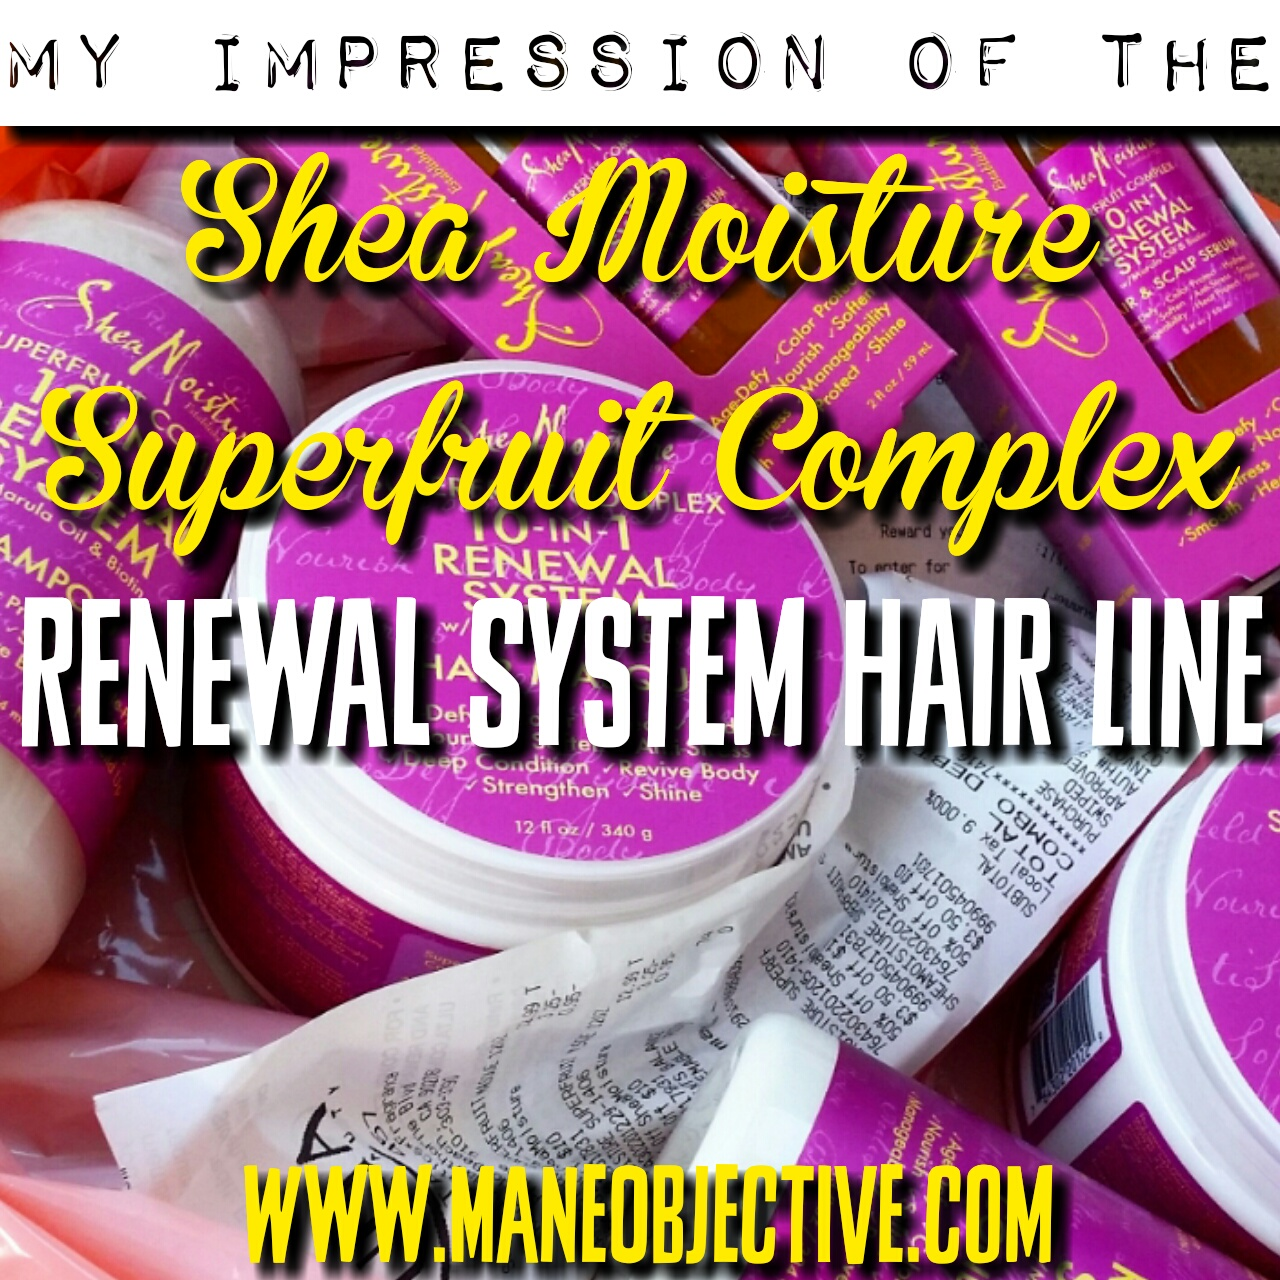 shea-moisture-superfruit-complex-review